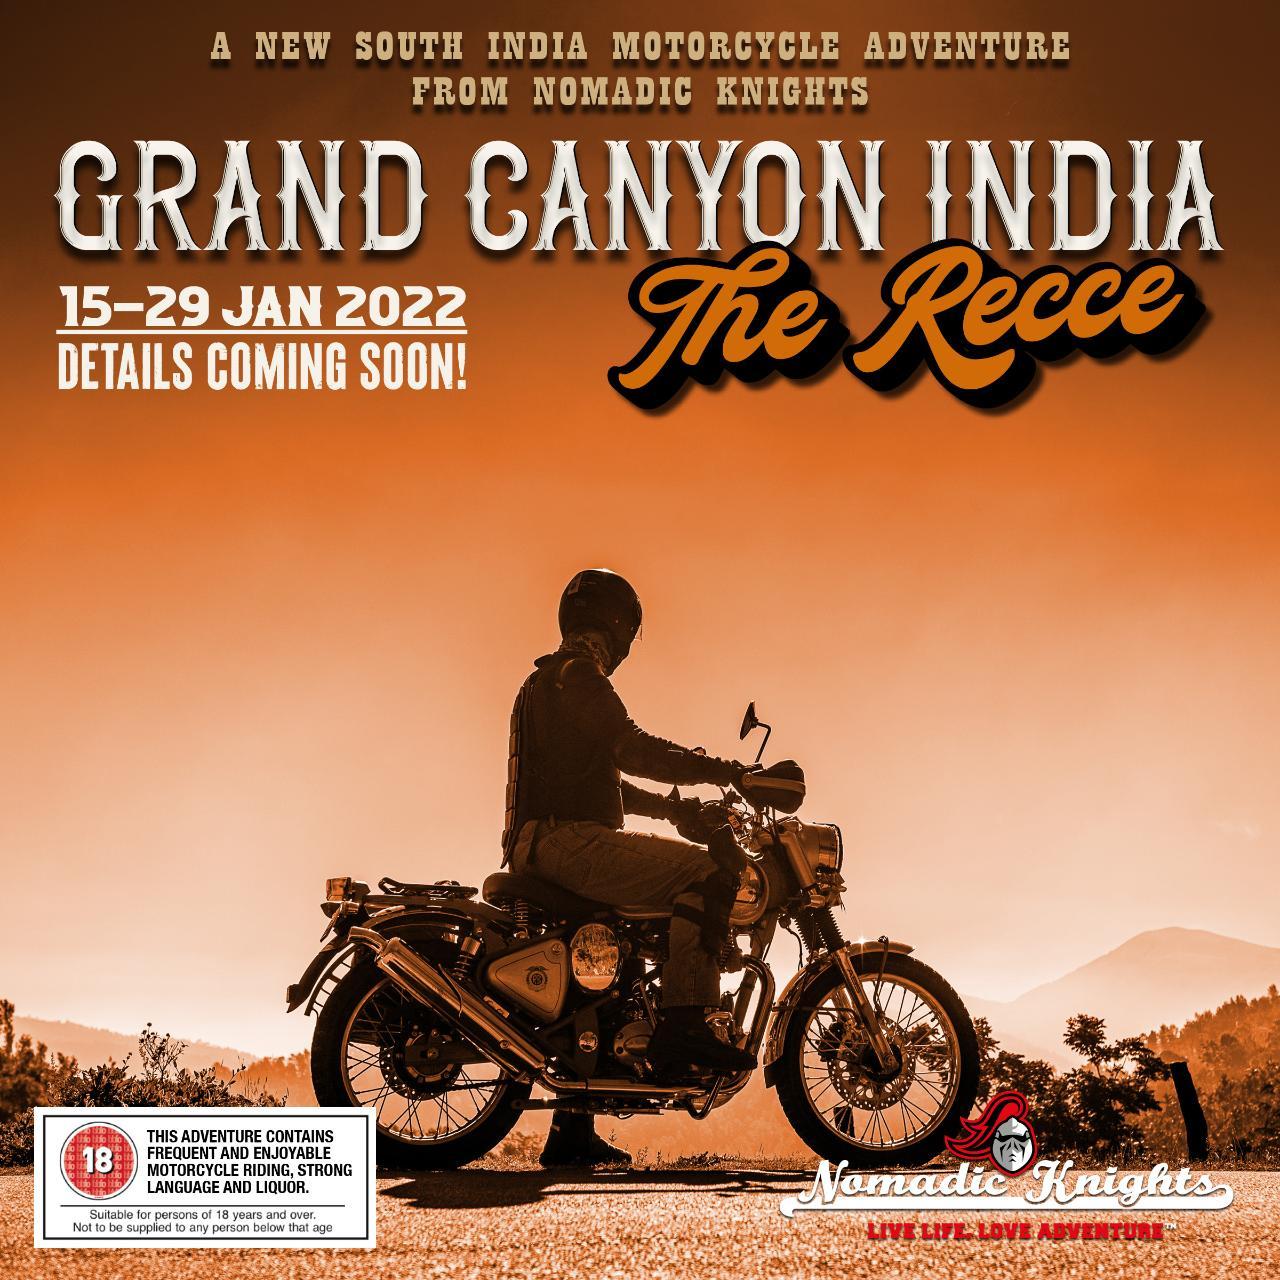 GRAND CANYON INDIA - THE RECCE: 15 - 29 JAN 2022